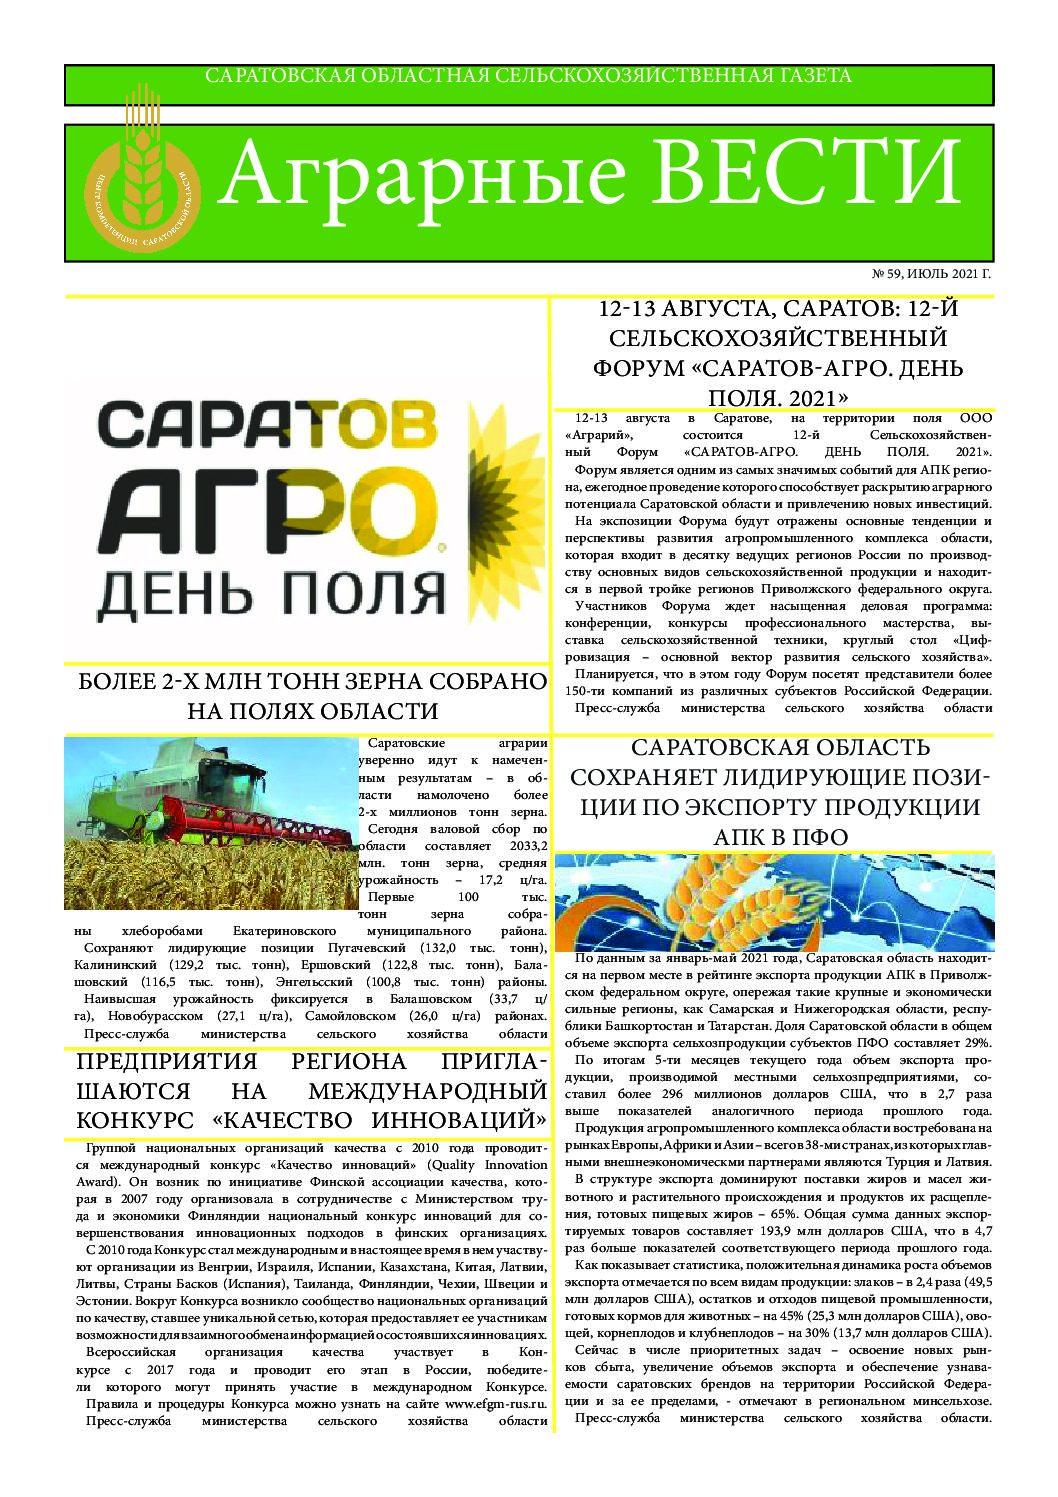 https://saratovagro.ru/wp-content/uploads/2021/08/Газета-июль-2021-pdf.jpg